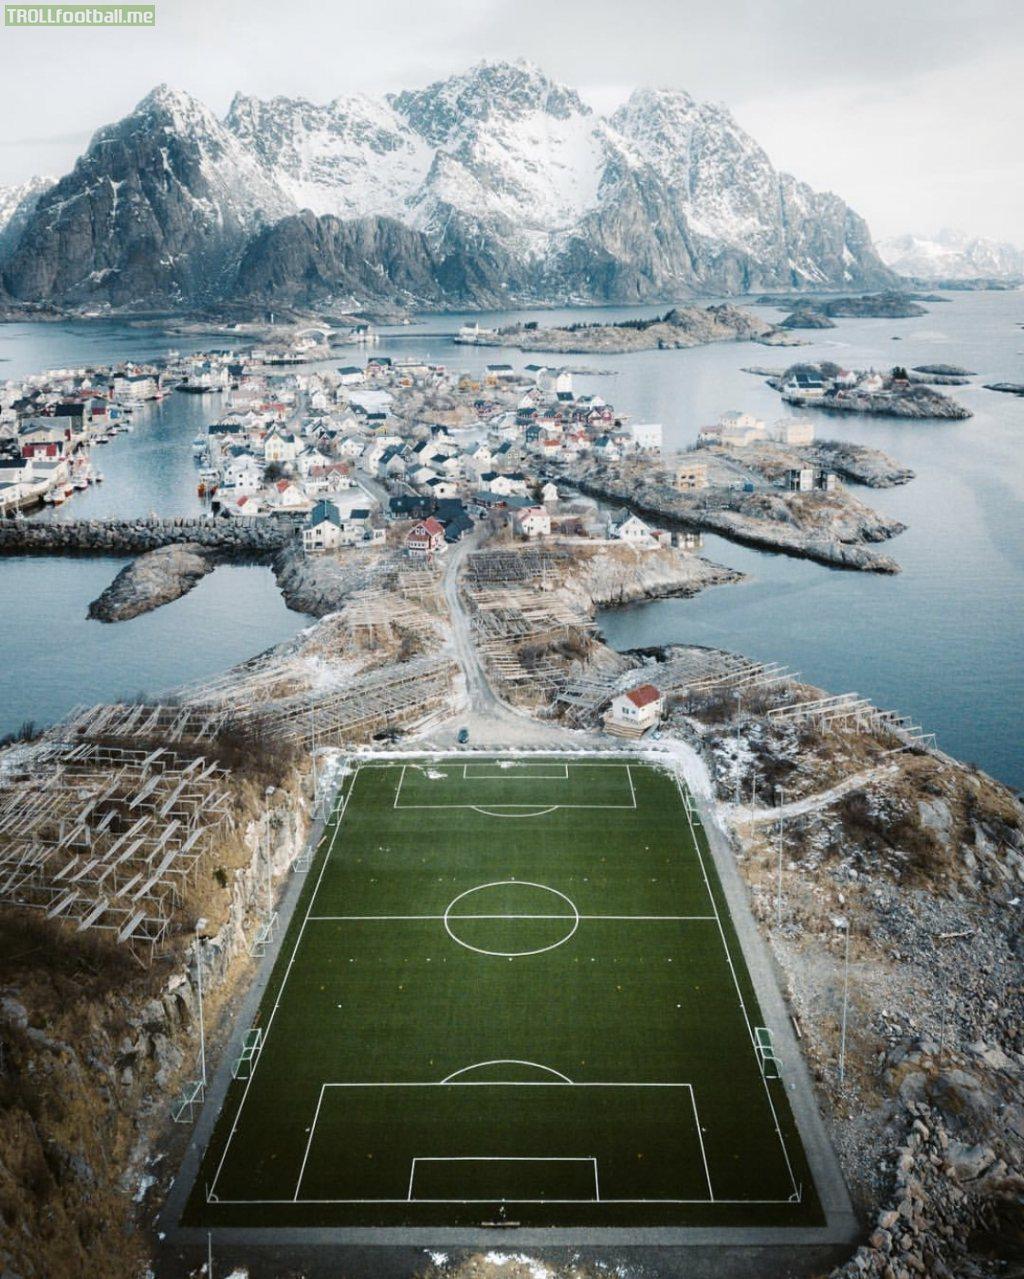 Norwegian Soccer Pitch